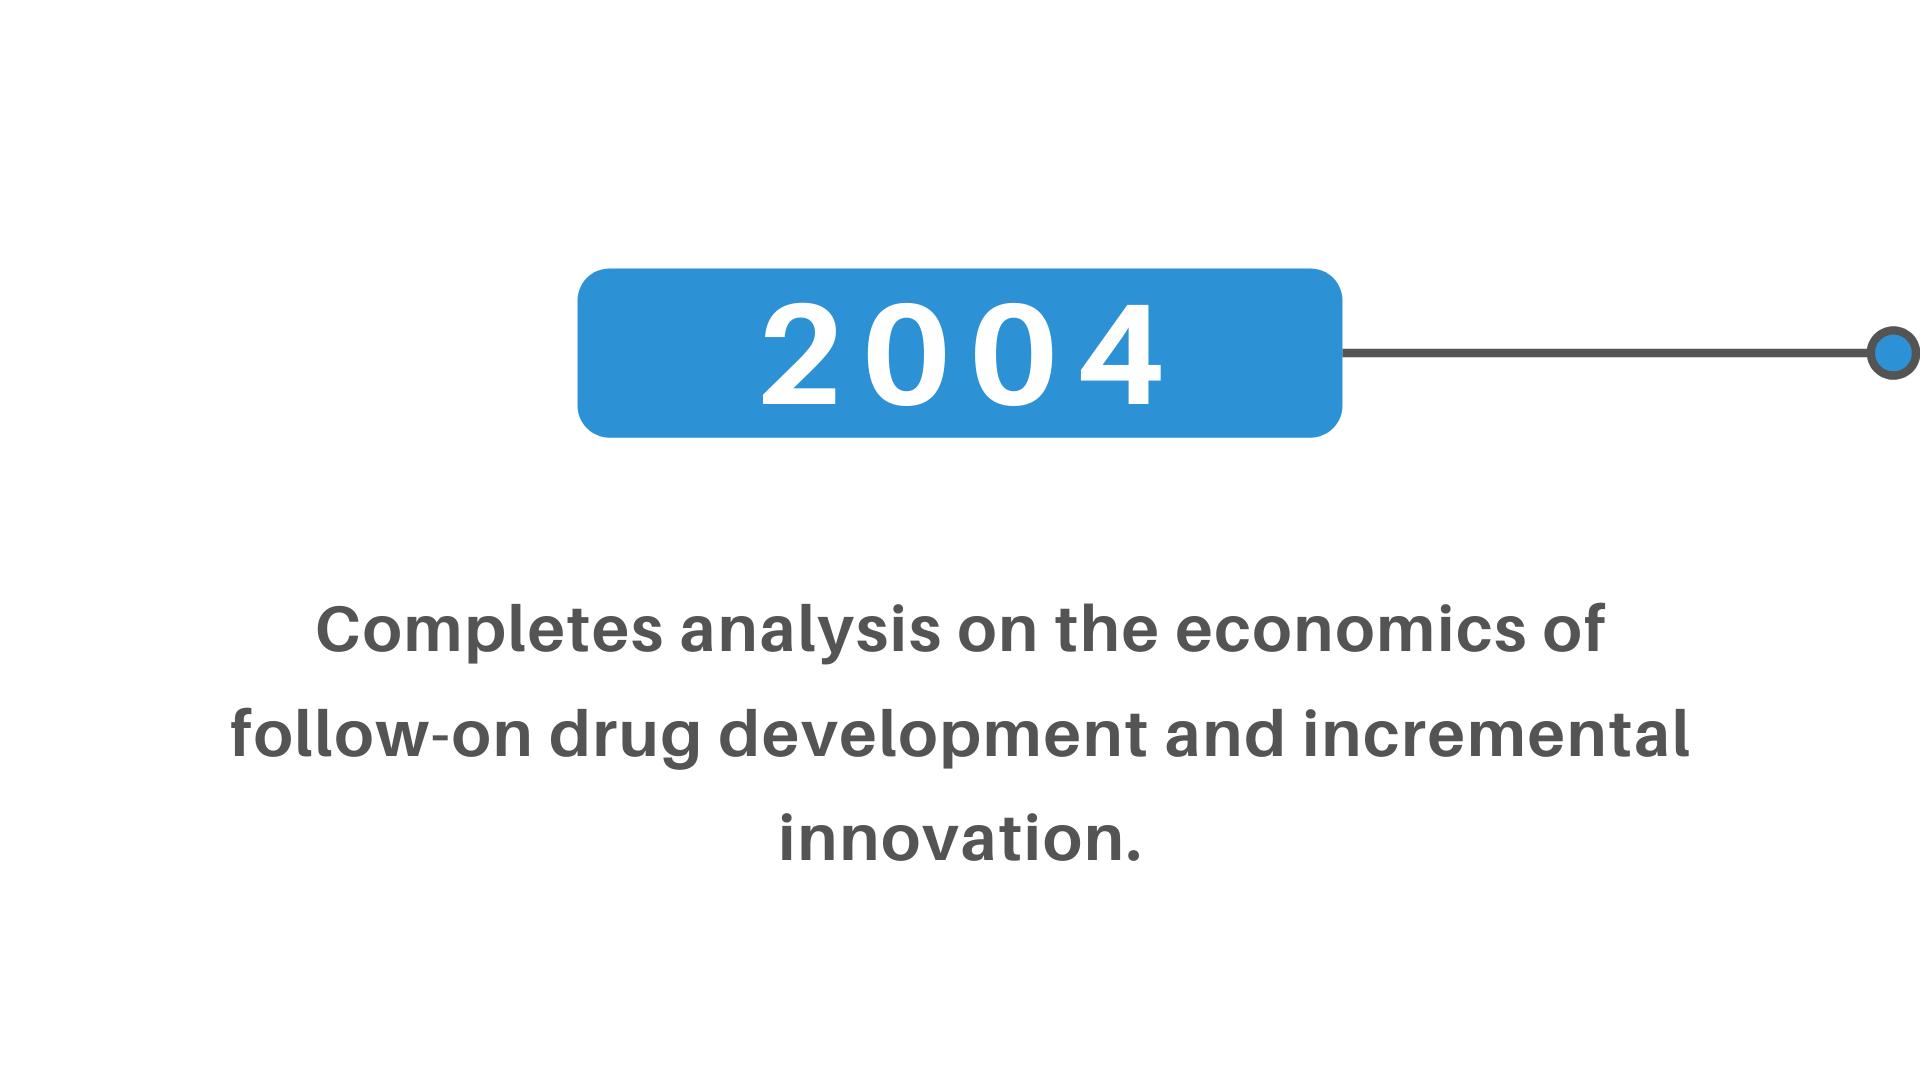 follow-on drug development incremental innovation